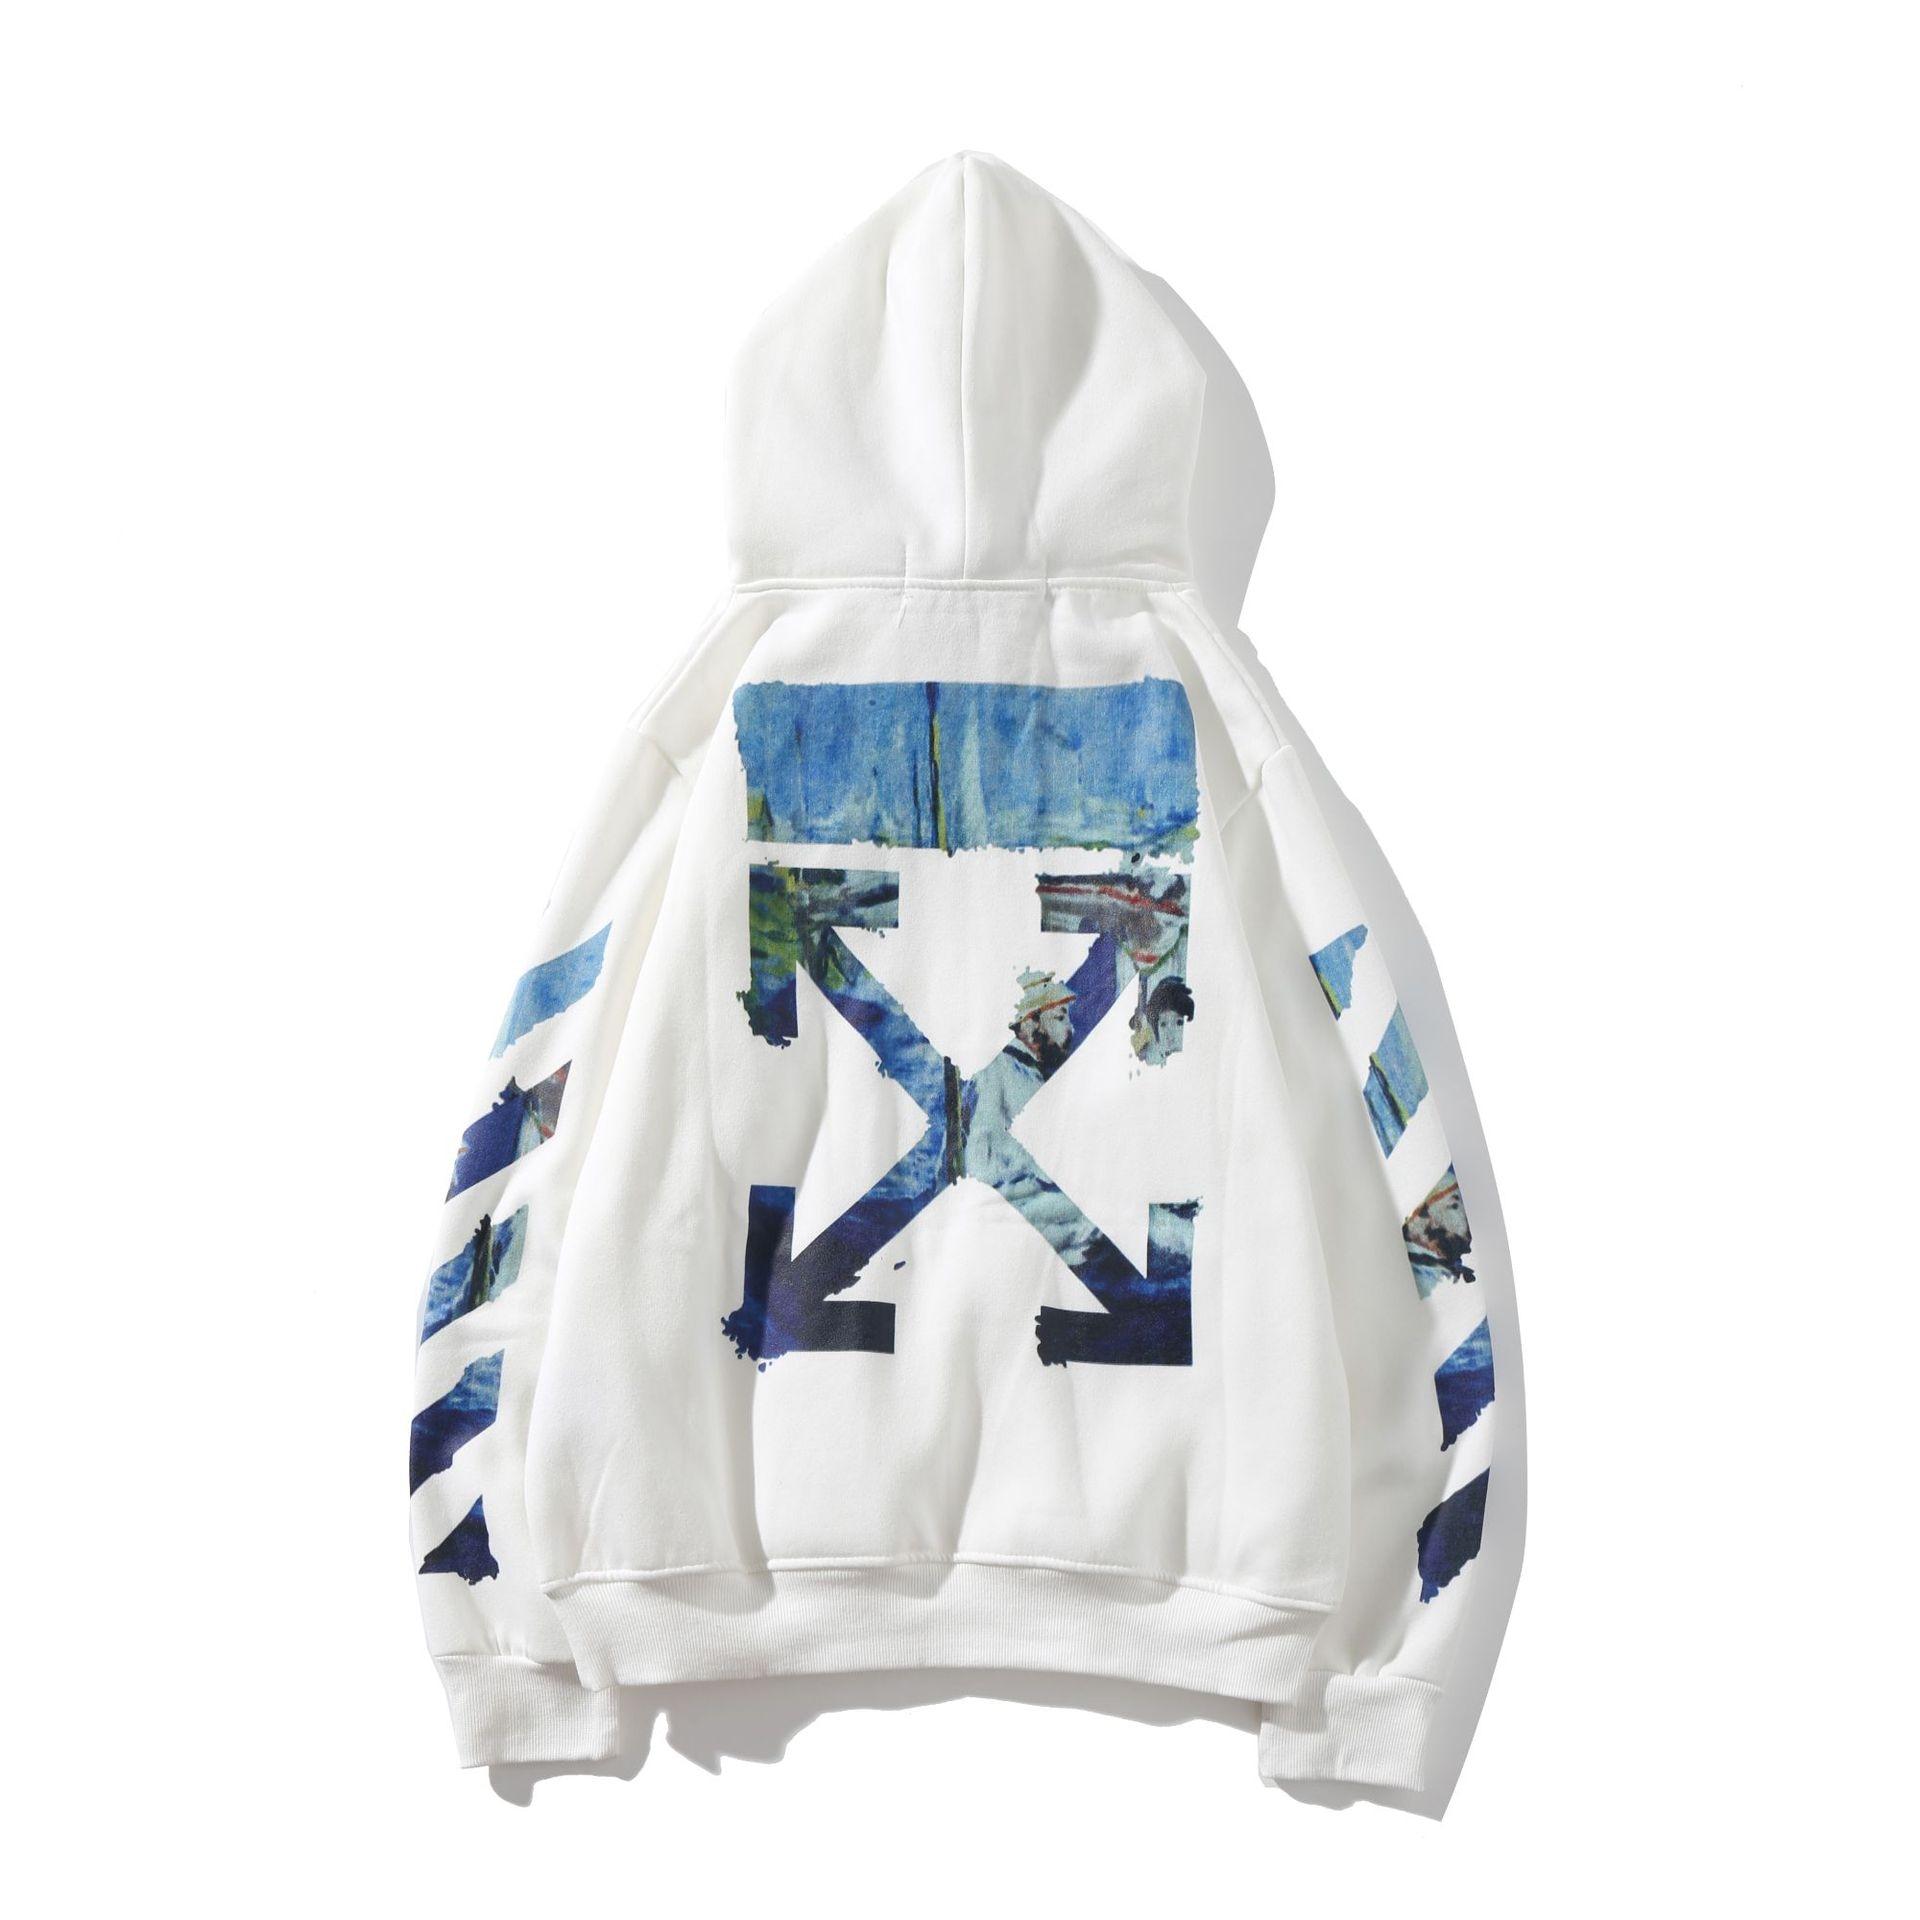 Off Ow White Graffiti Oil Painting Arrowhead Zipper Hoodie Popular Brand Men And Women Couples Men's Sweatshirts & Hoodies Plus